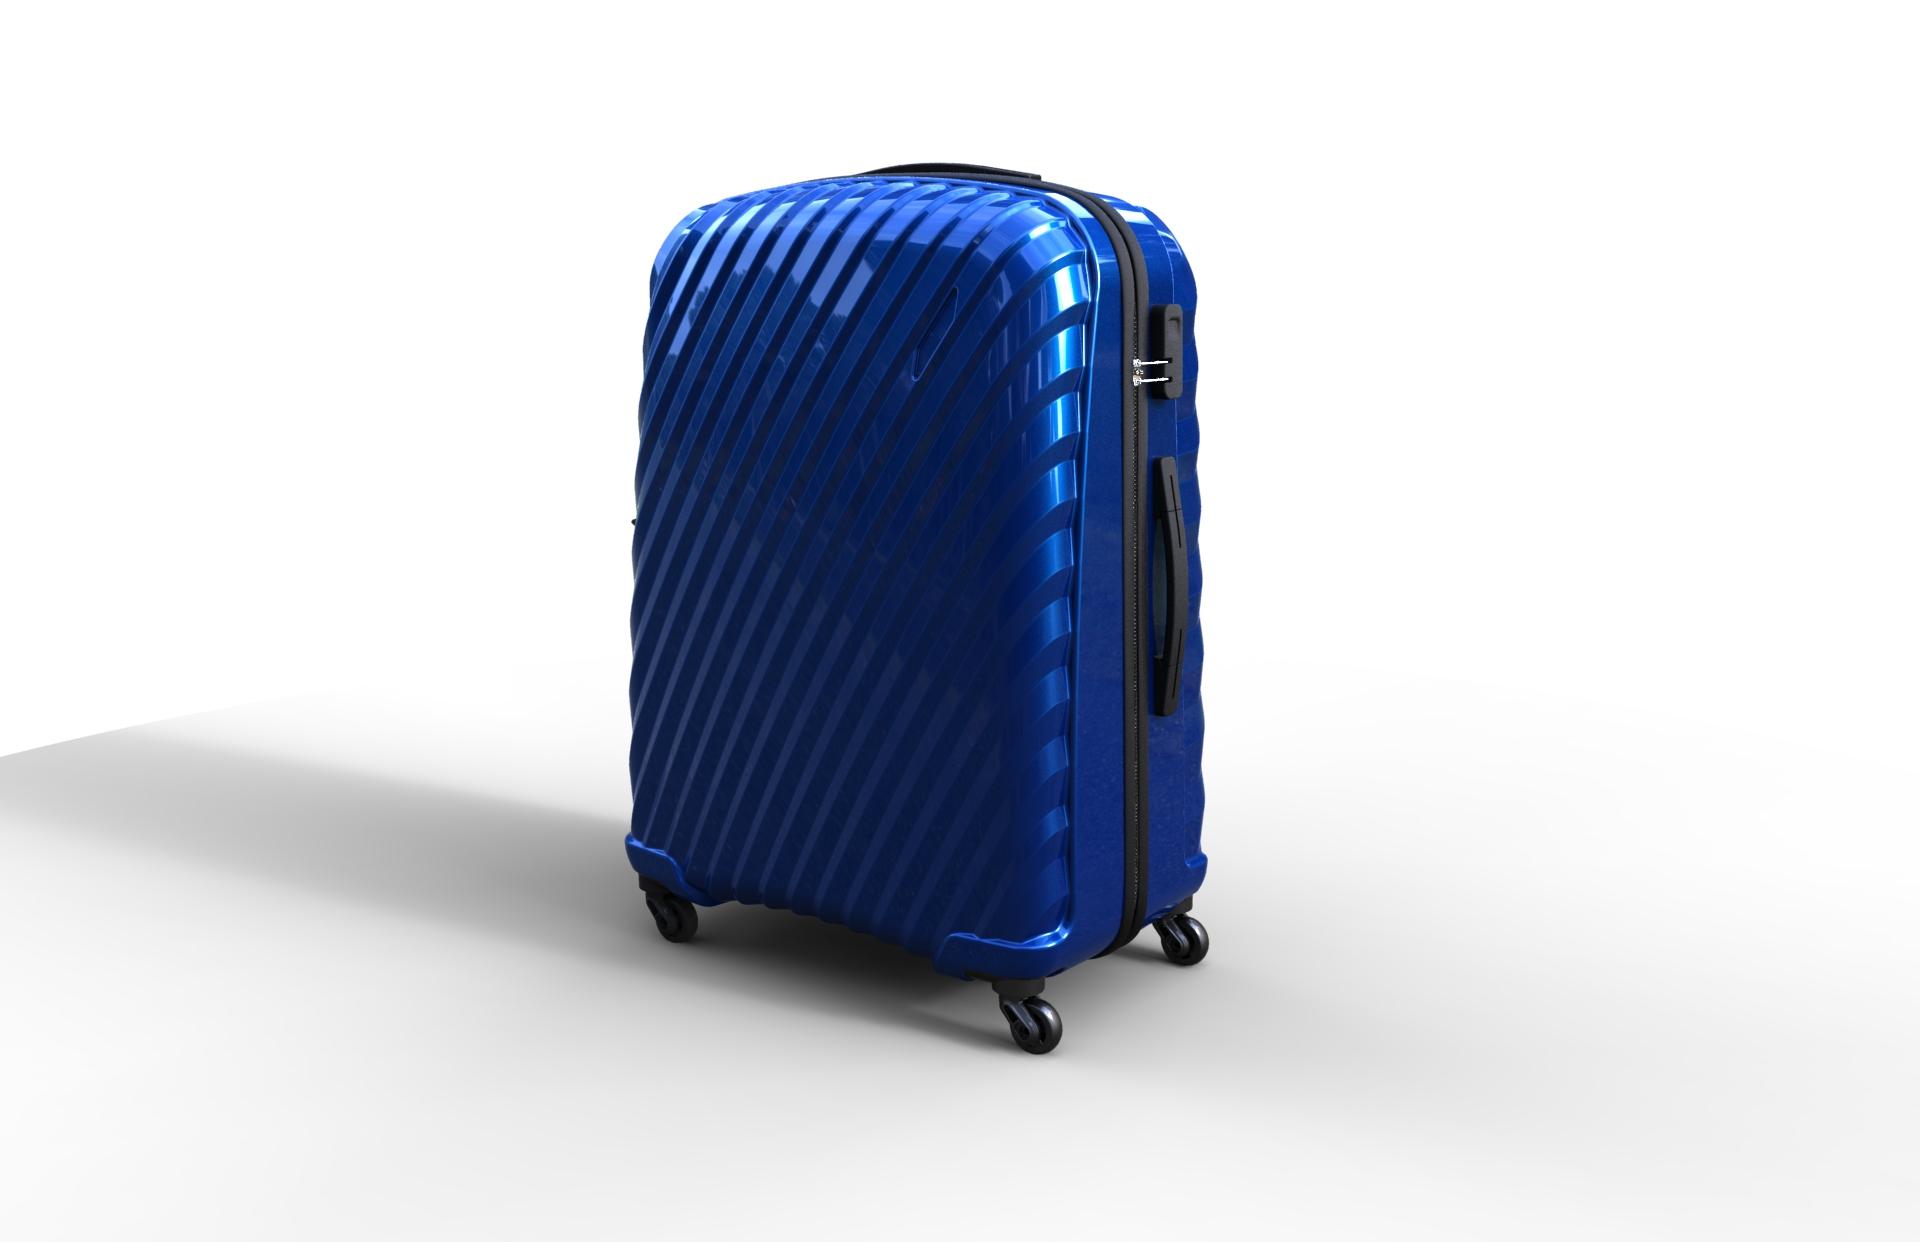 trolley suitcase bag 03 3d model max fbx ma mb obj 286003